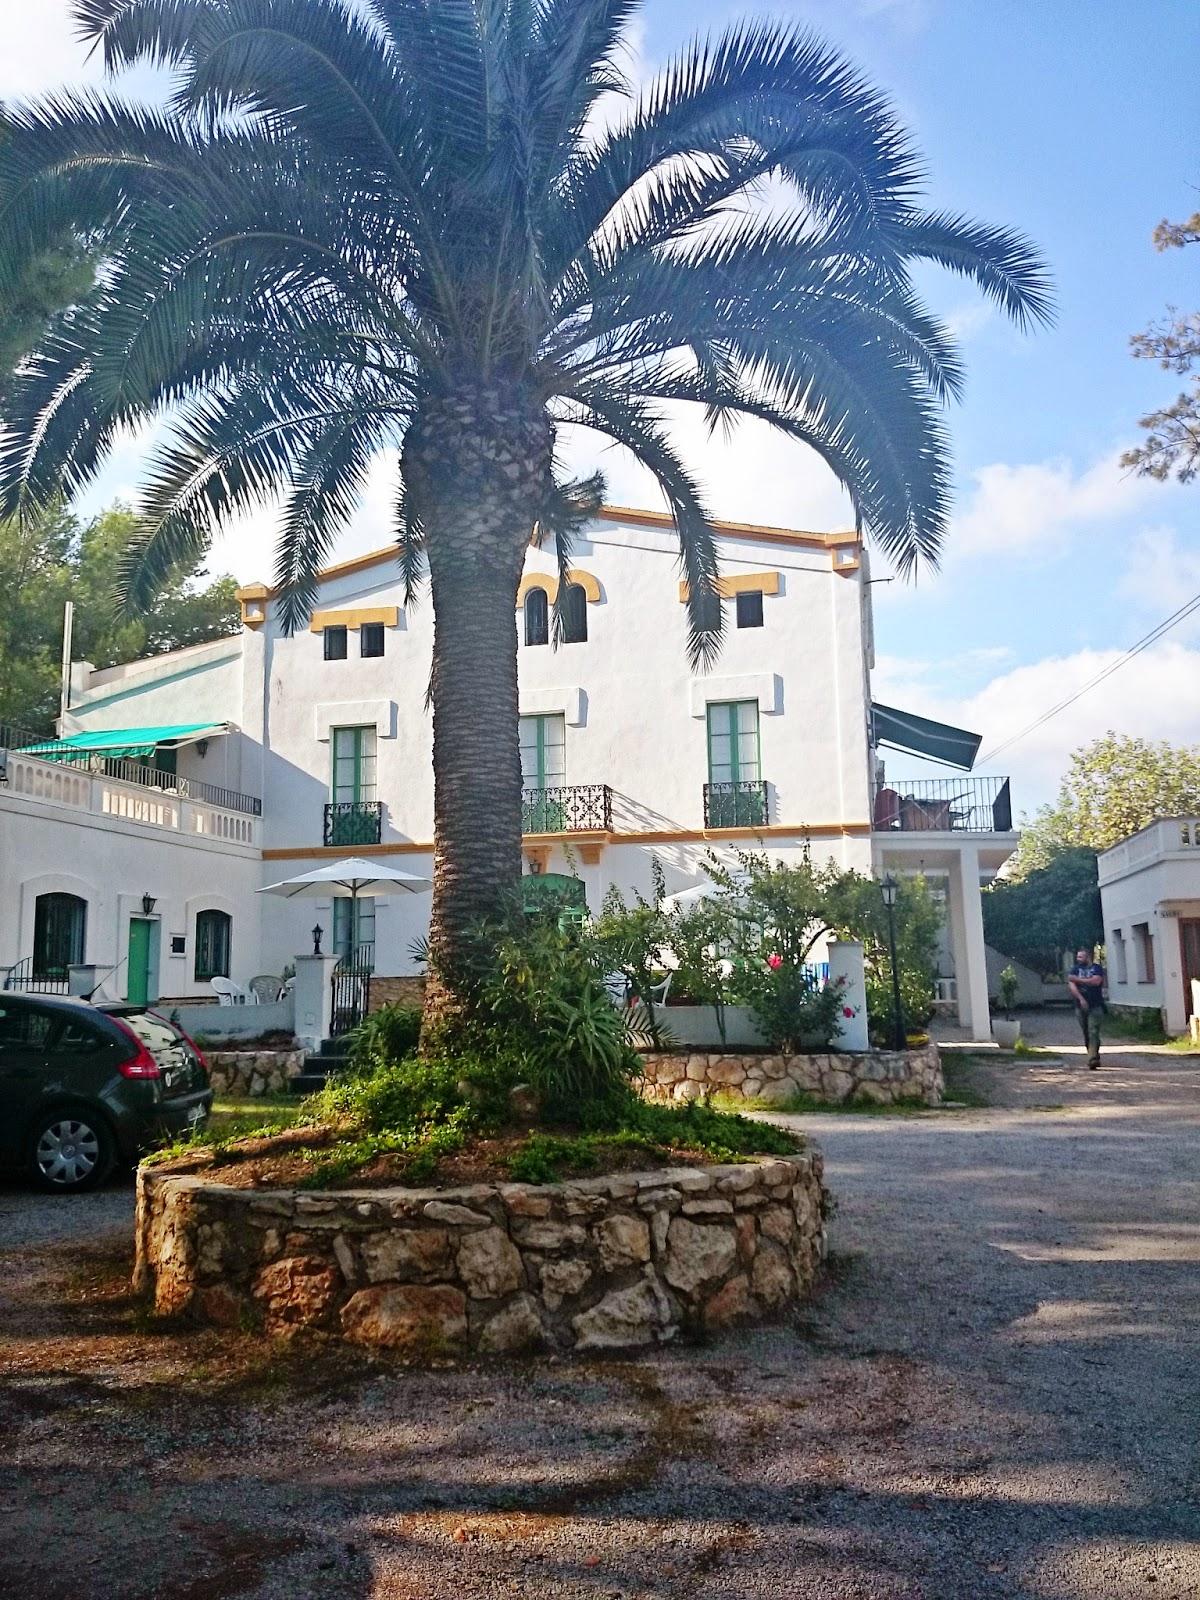 palma,apartamenty Hiszpania,inspiracje z Hiszpanii,garden Espana,